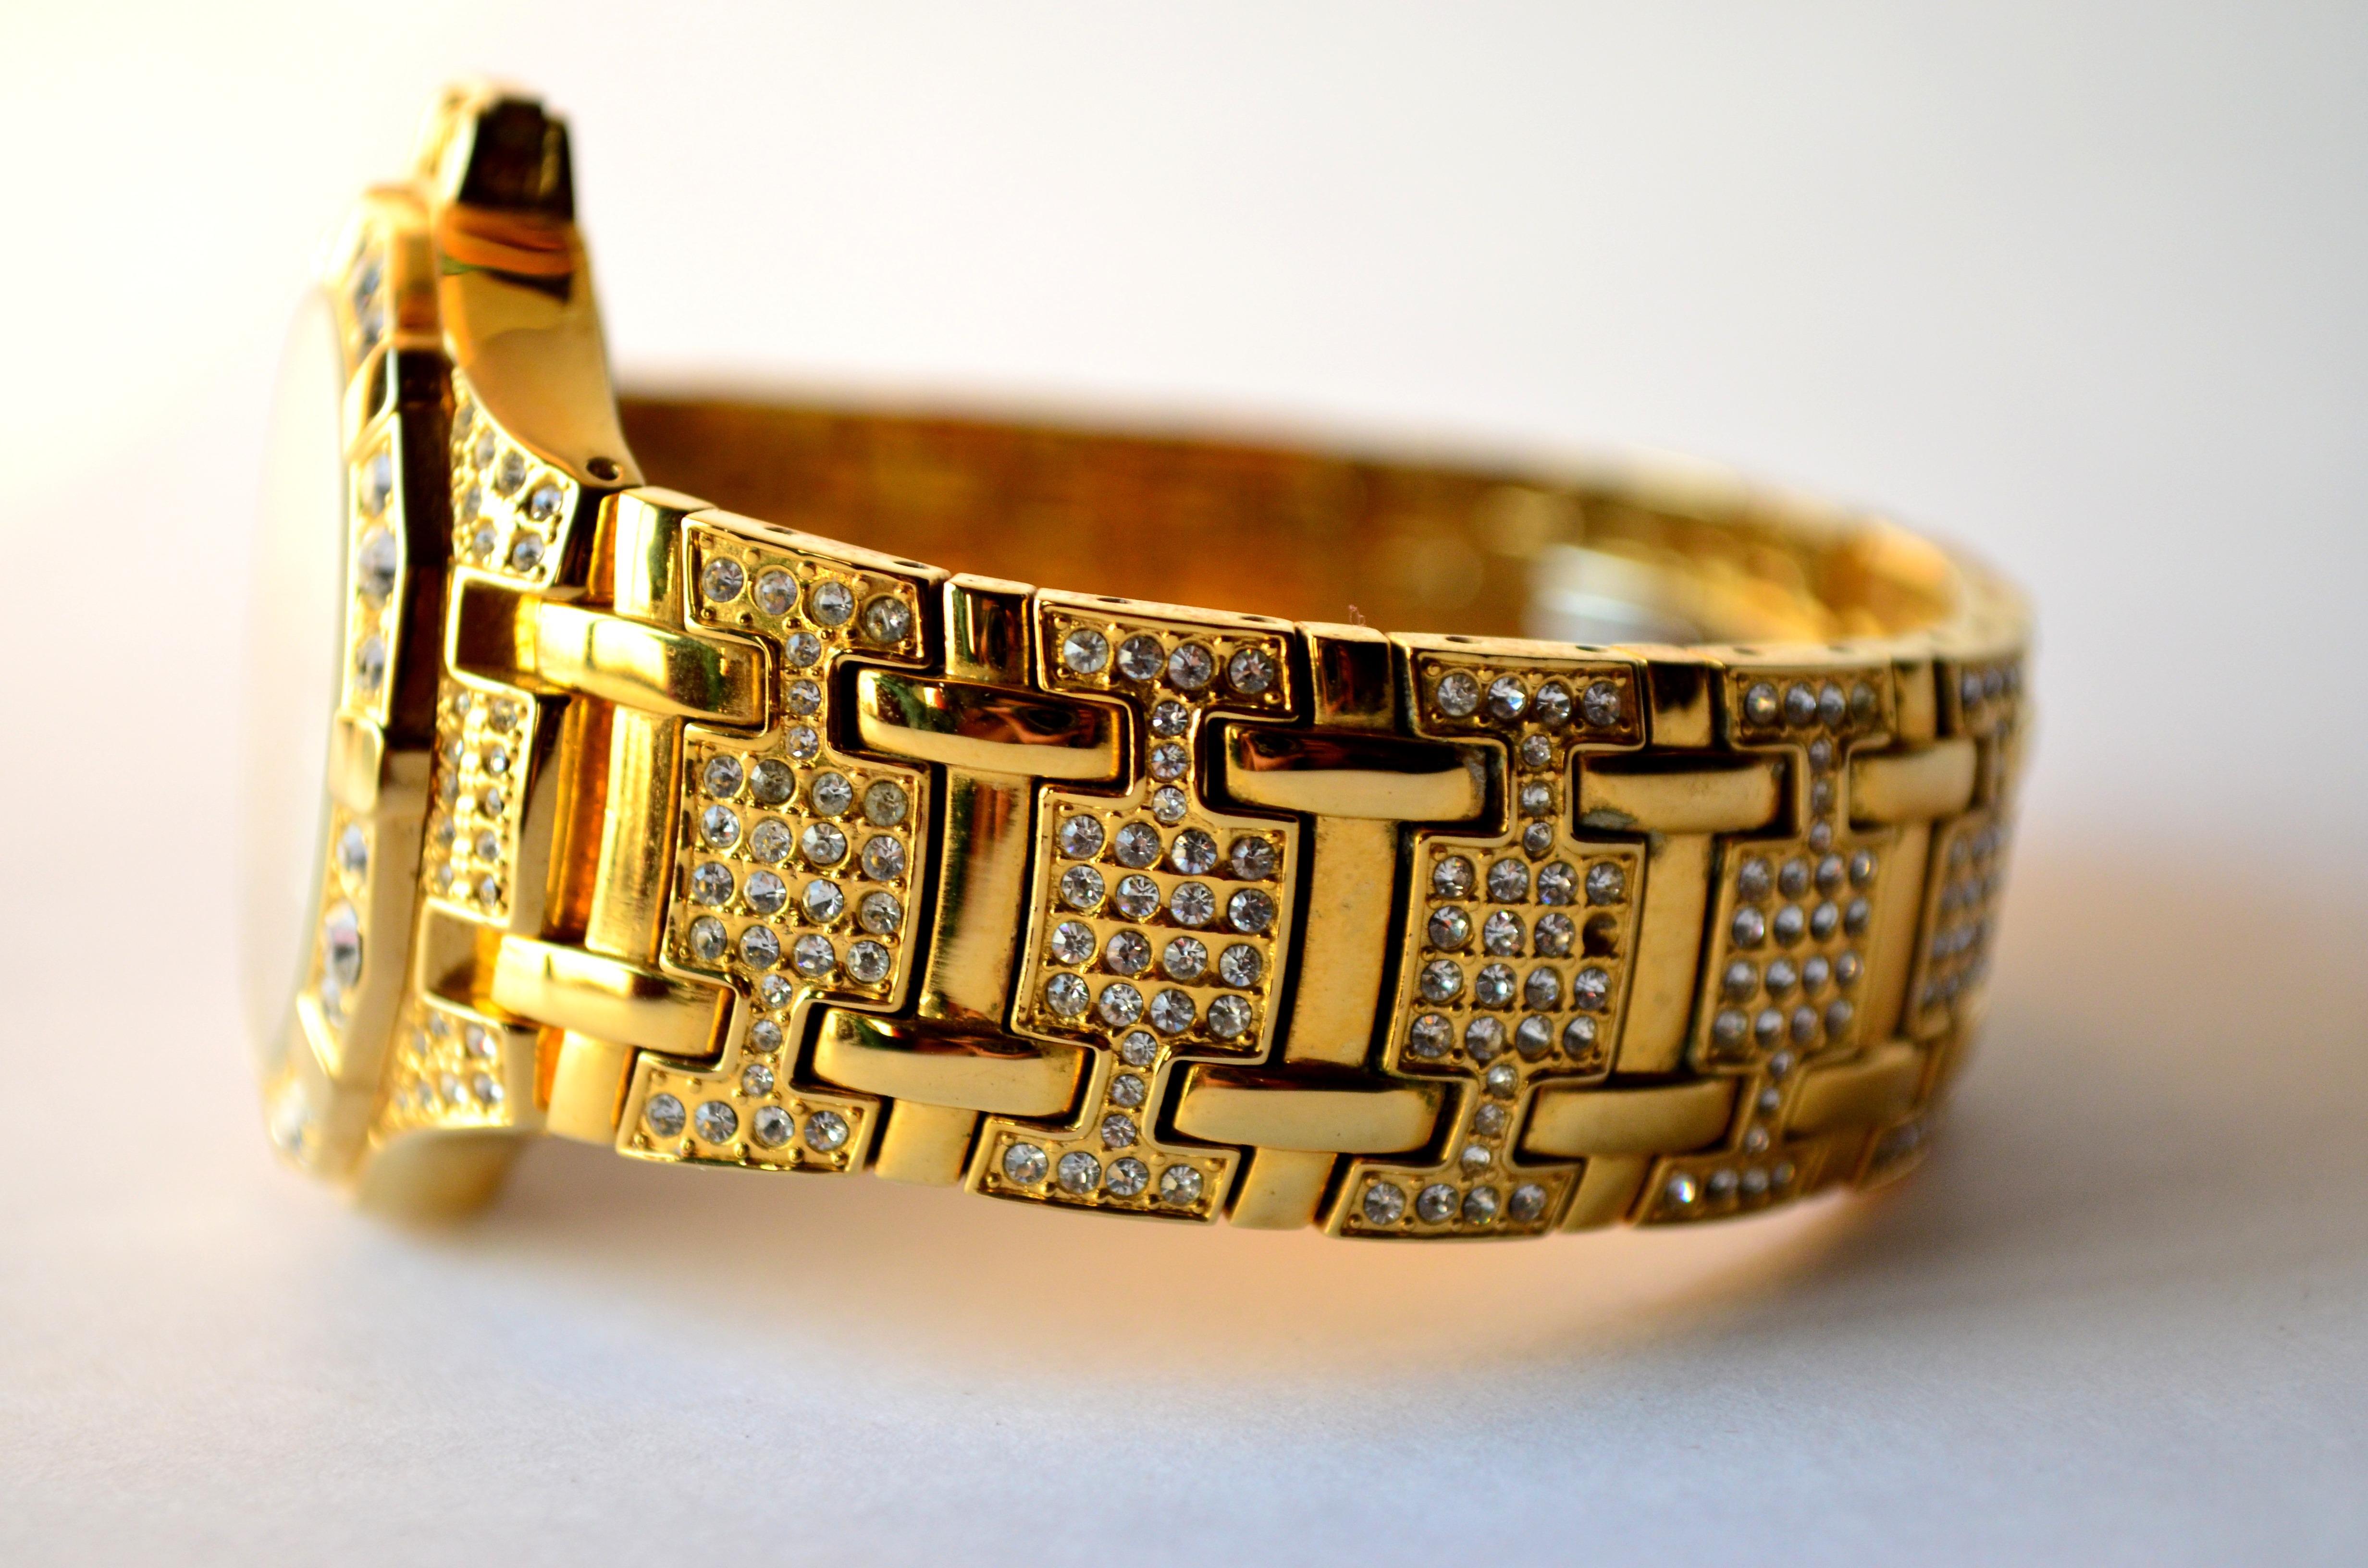 Kostenlose Foto Uhr Ring Band Metall Mode Armreif Schmuck